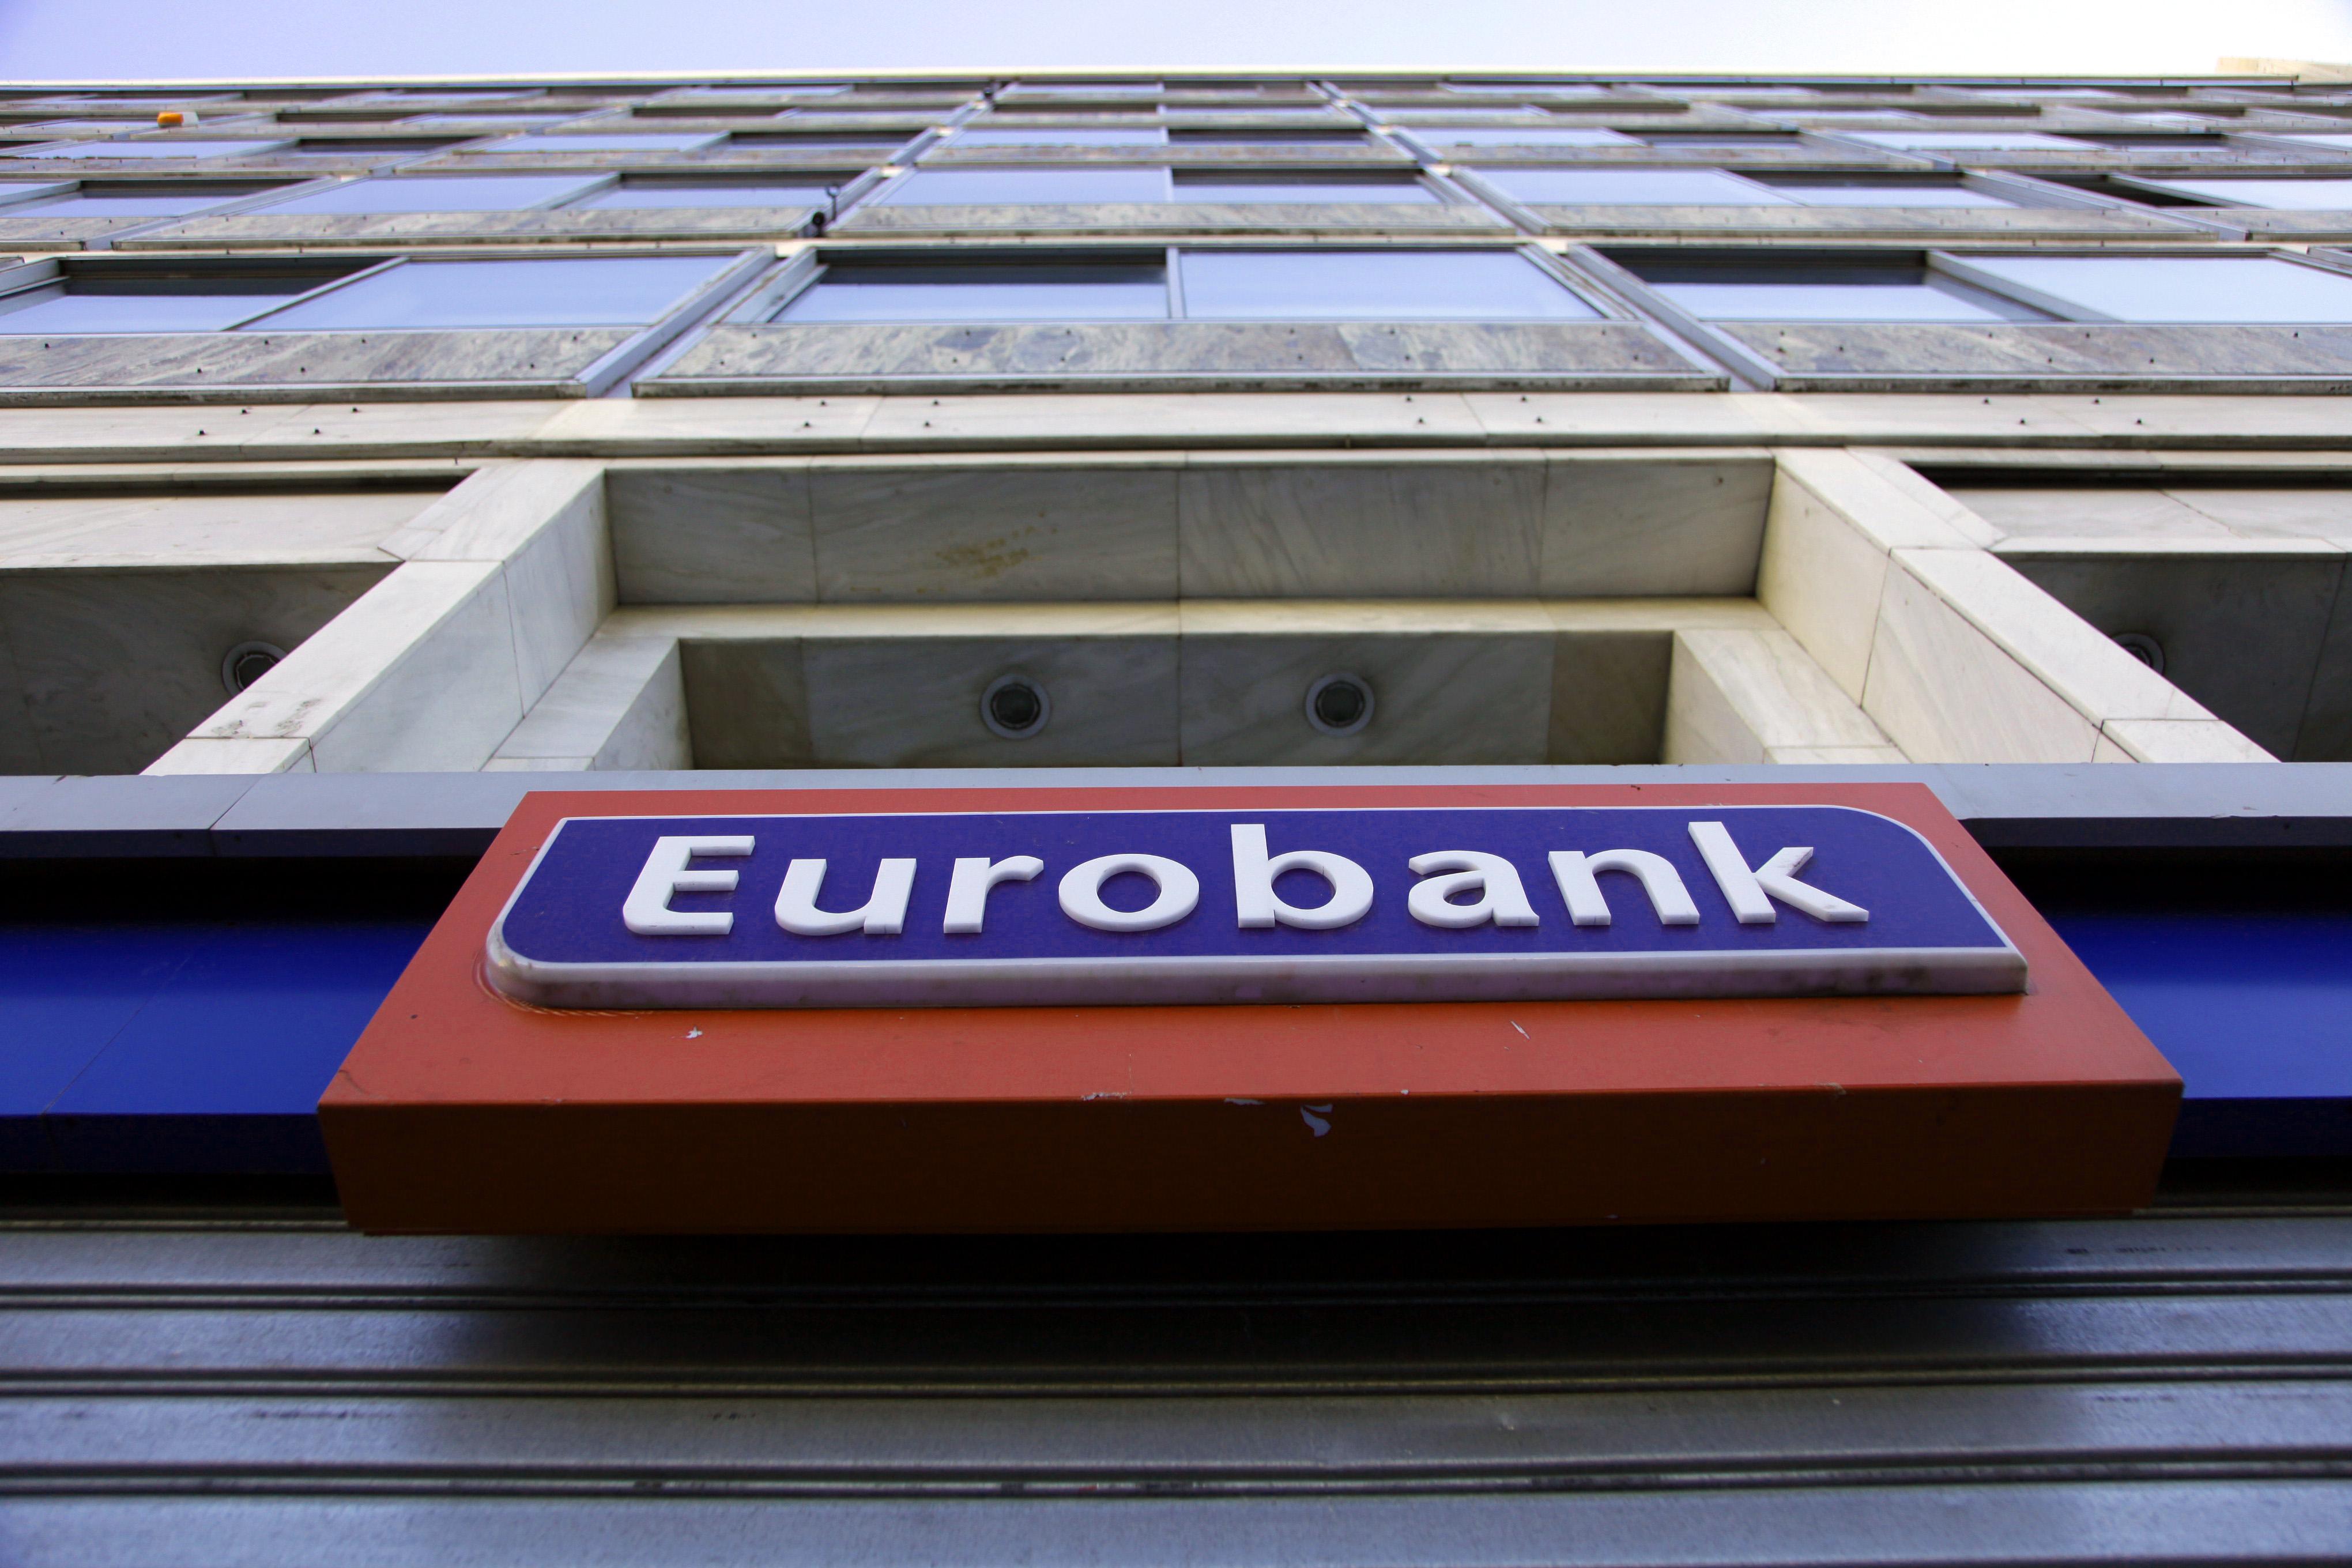 Eurobank: Κατανάλωση, εξαγωγές, επενδύσεις ευθύνονται για την ύφεση   tovima.gr